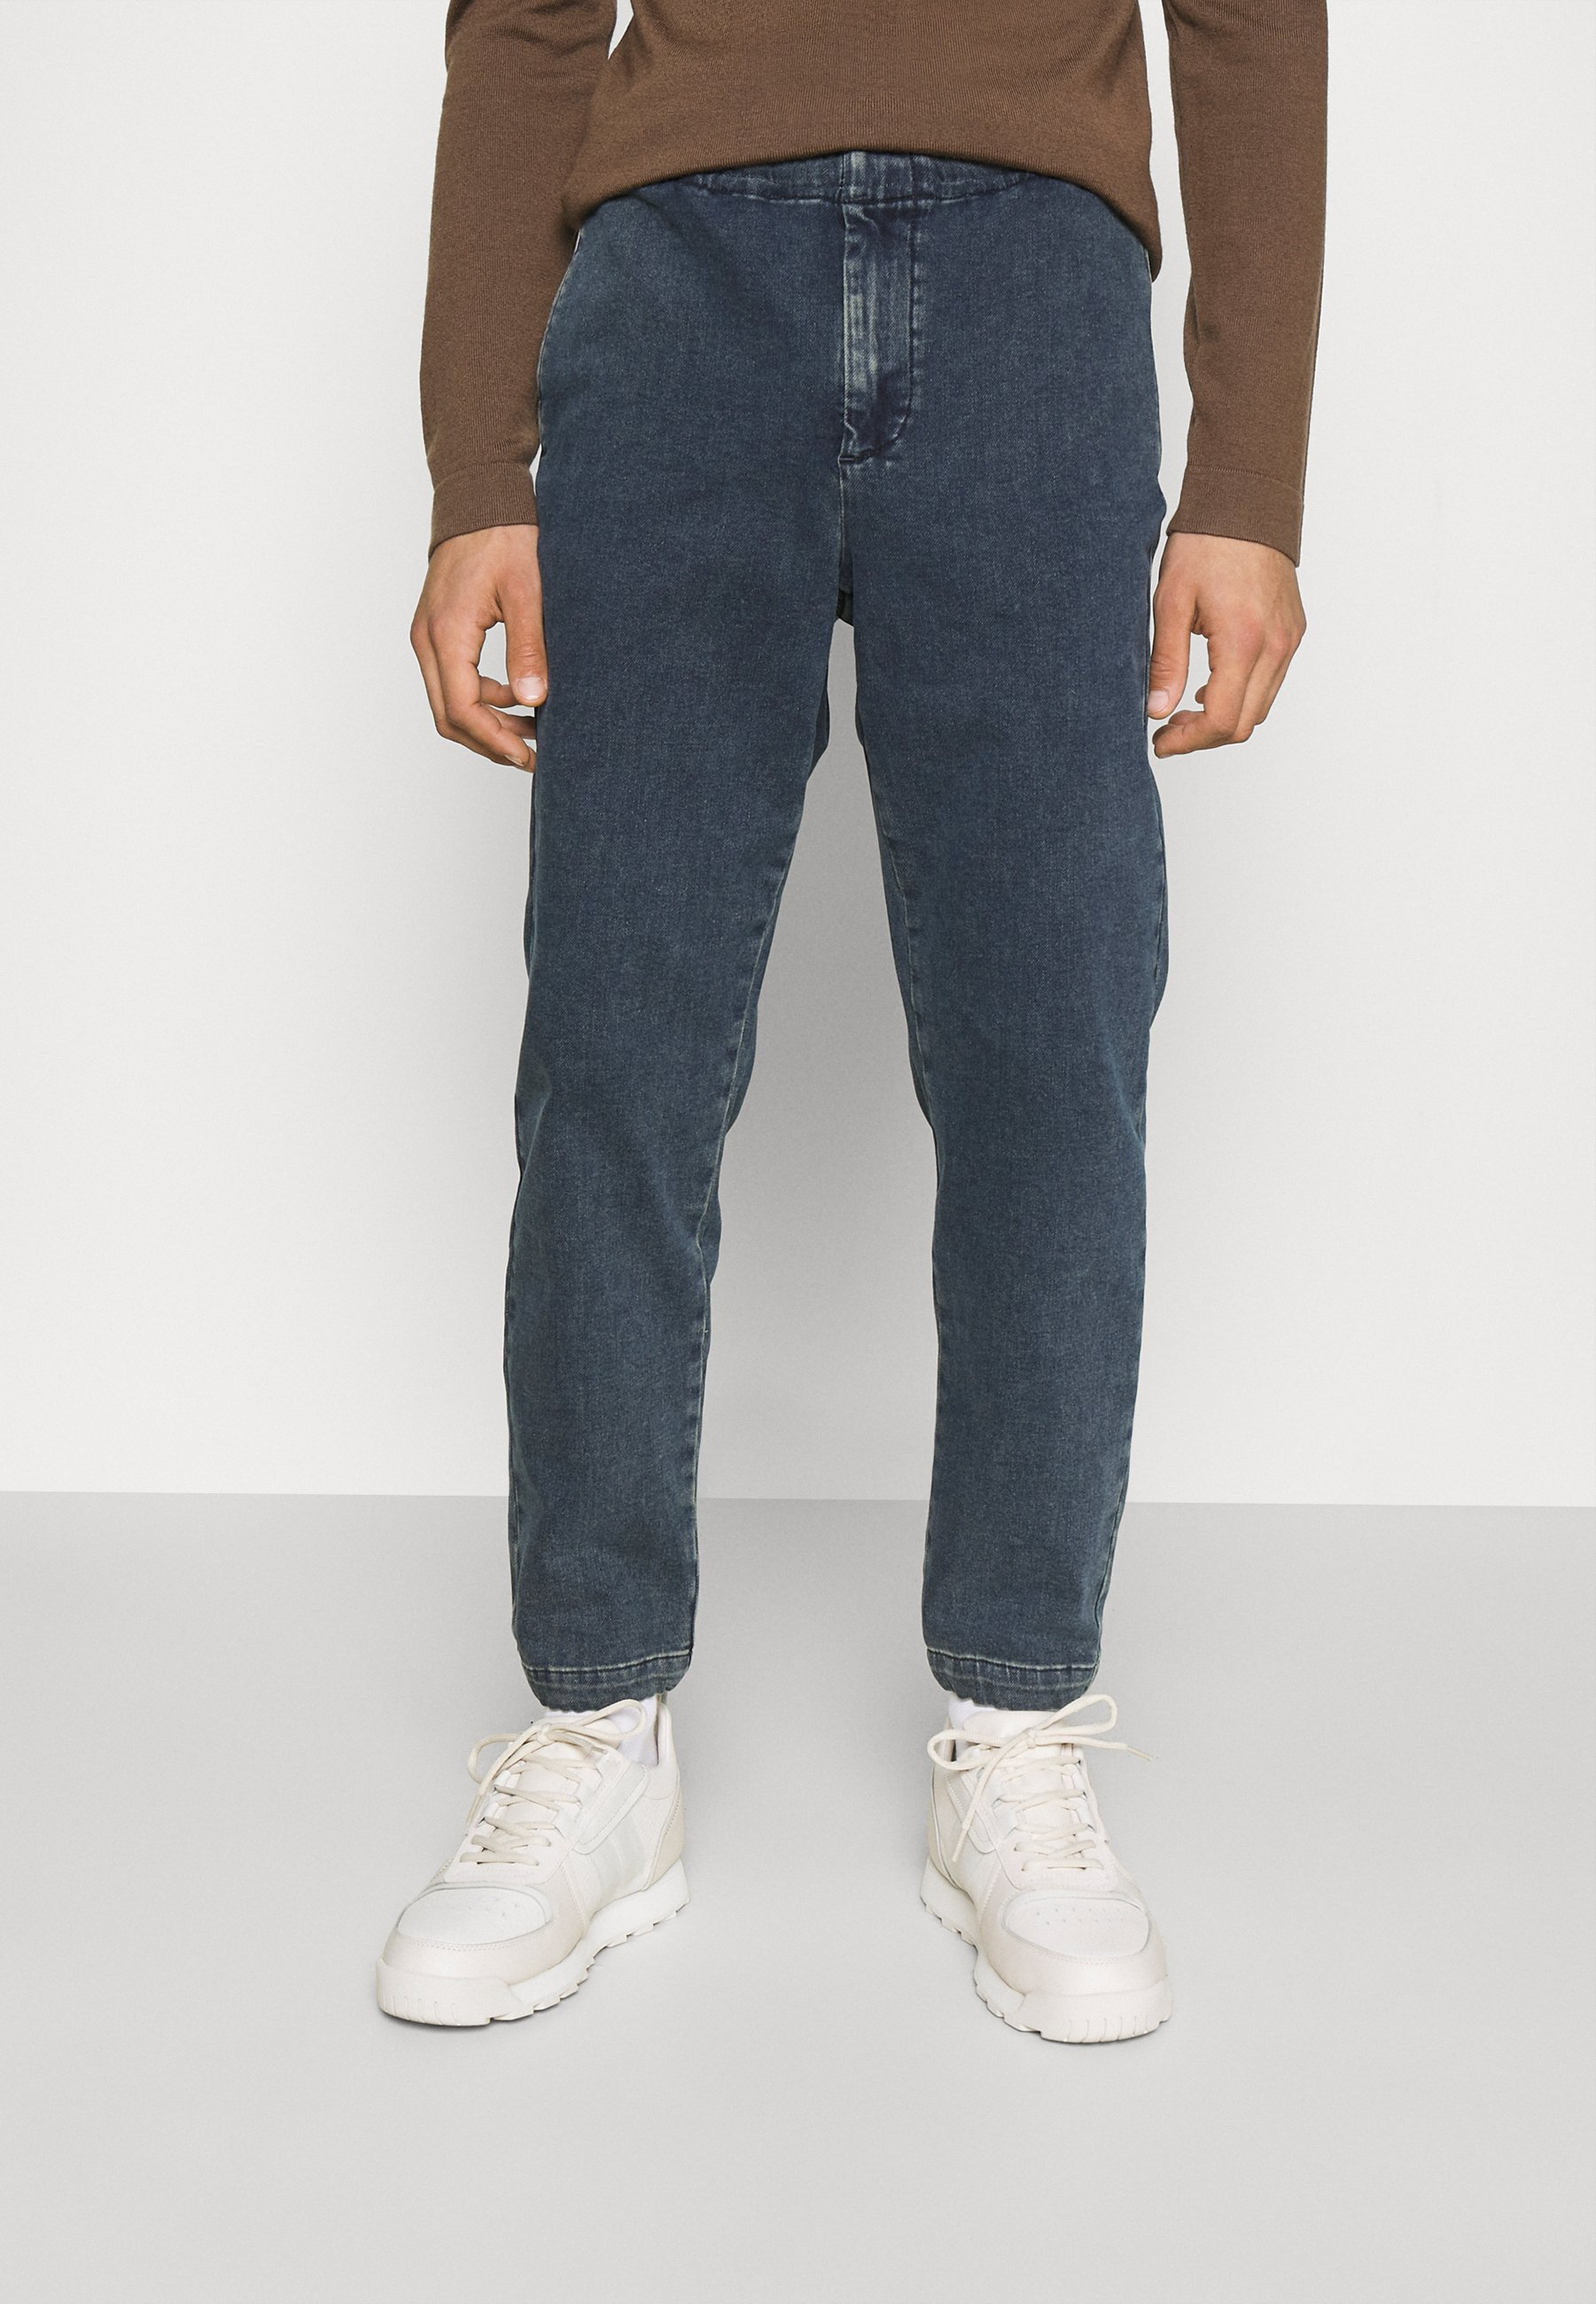 Uomo PROSEPECT JOGGER - Jeans slim fit